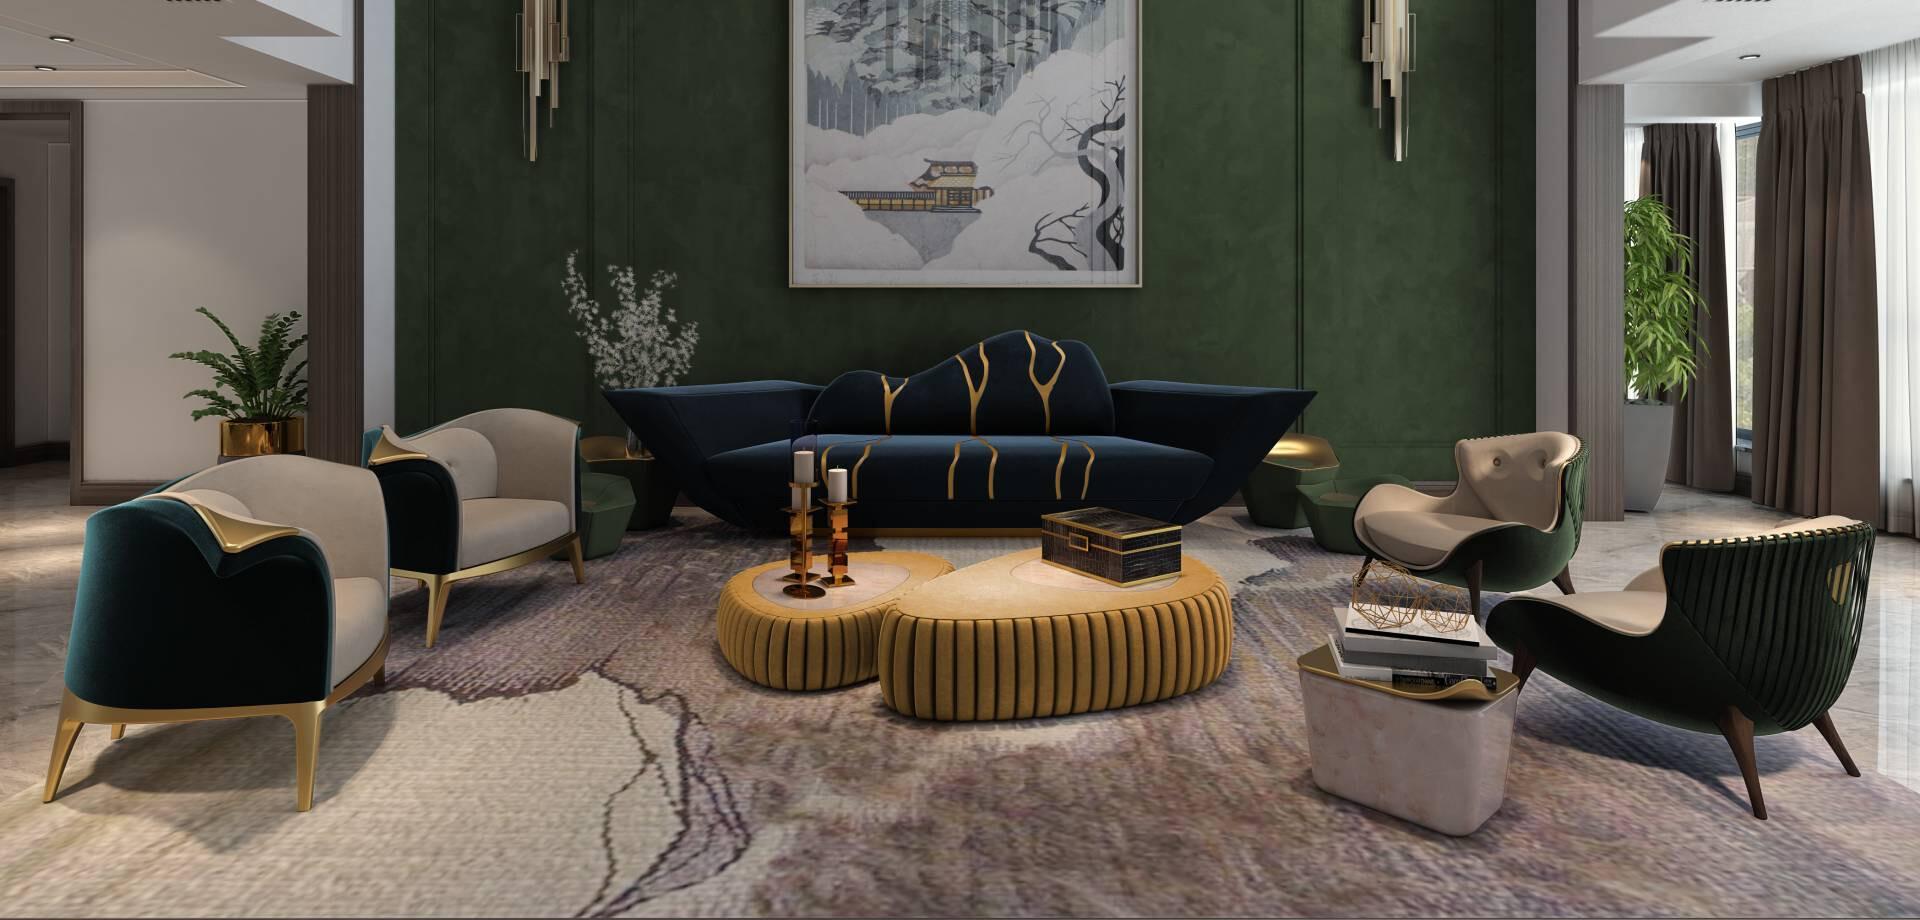 Luxury Interior Design - ALMA de LUCE Project in Berlim